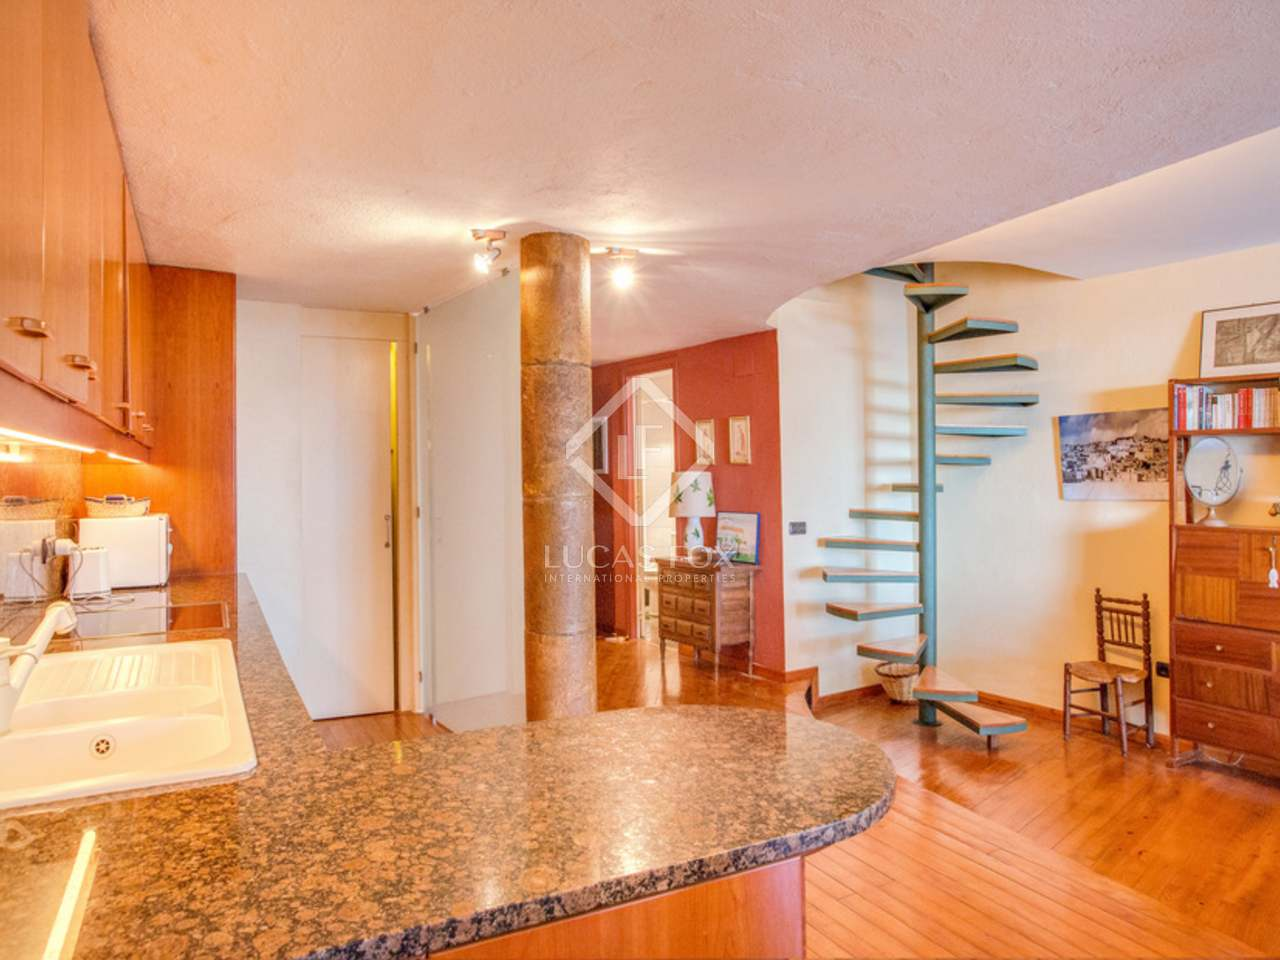 3 bedroom duplex for sale in sa tuna near begur for Three bedroom duplex